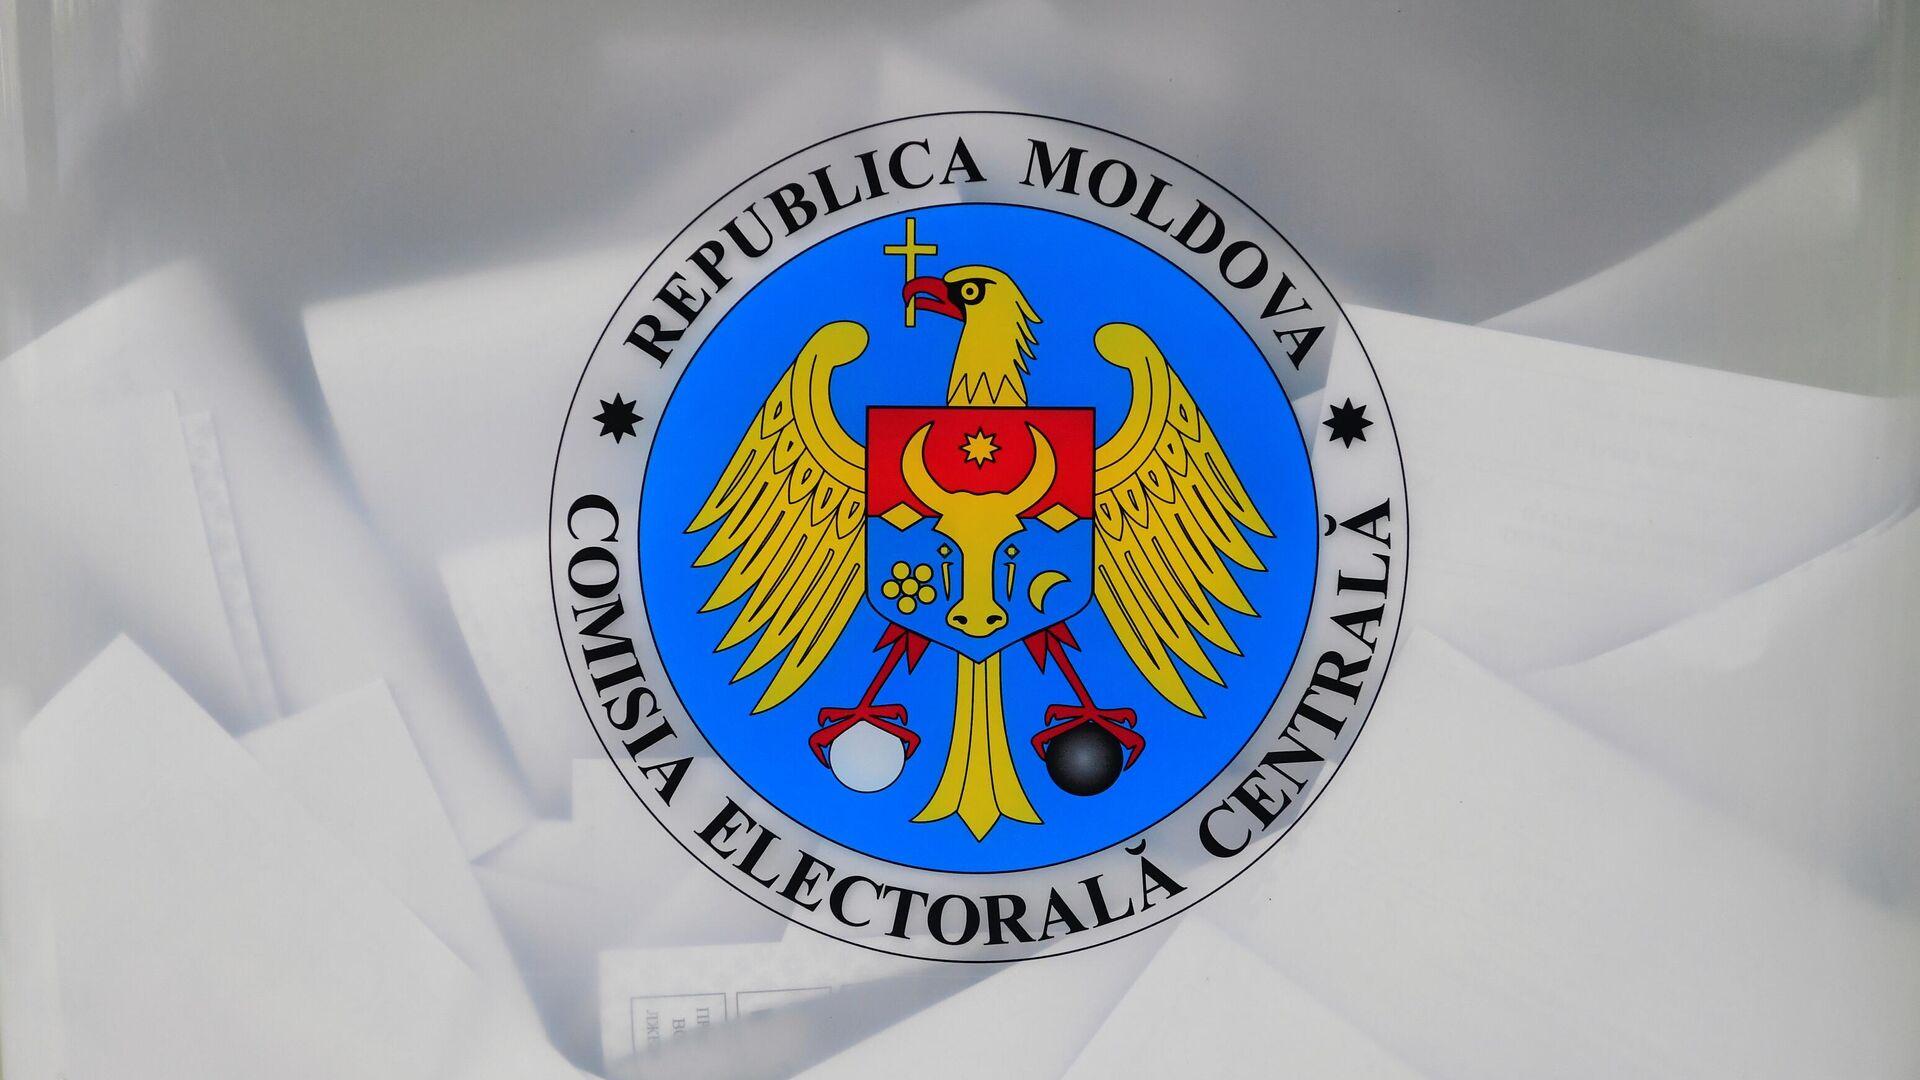 Papeletas en la urna durante las elecciones en Moldavia - Sputnik Mundo, 1920, 13.07.2021